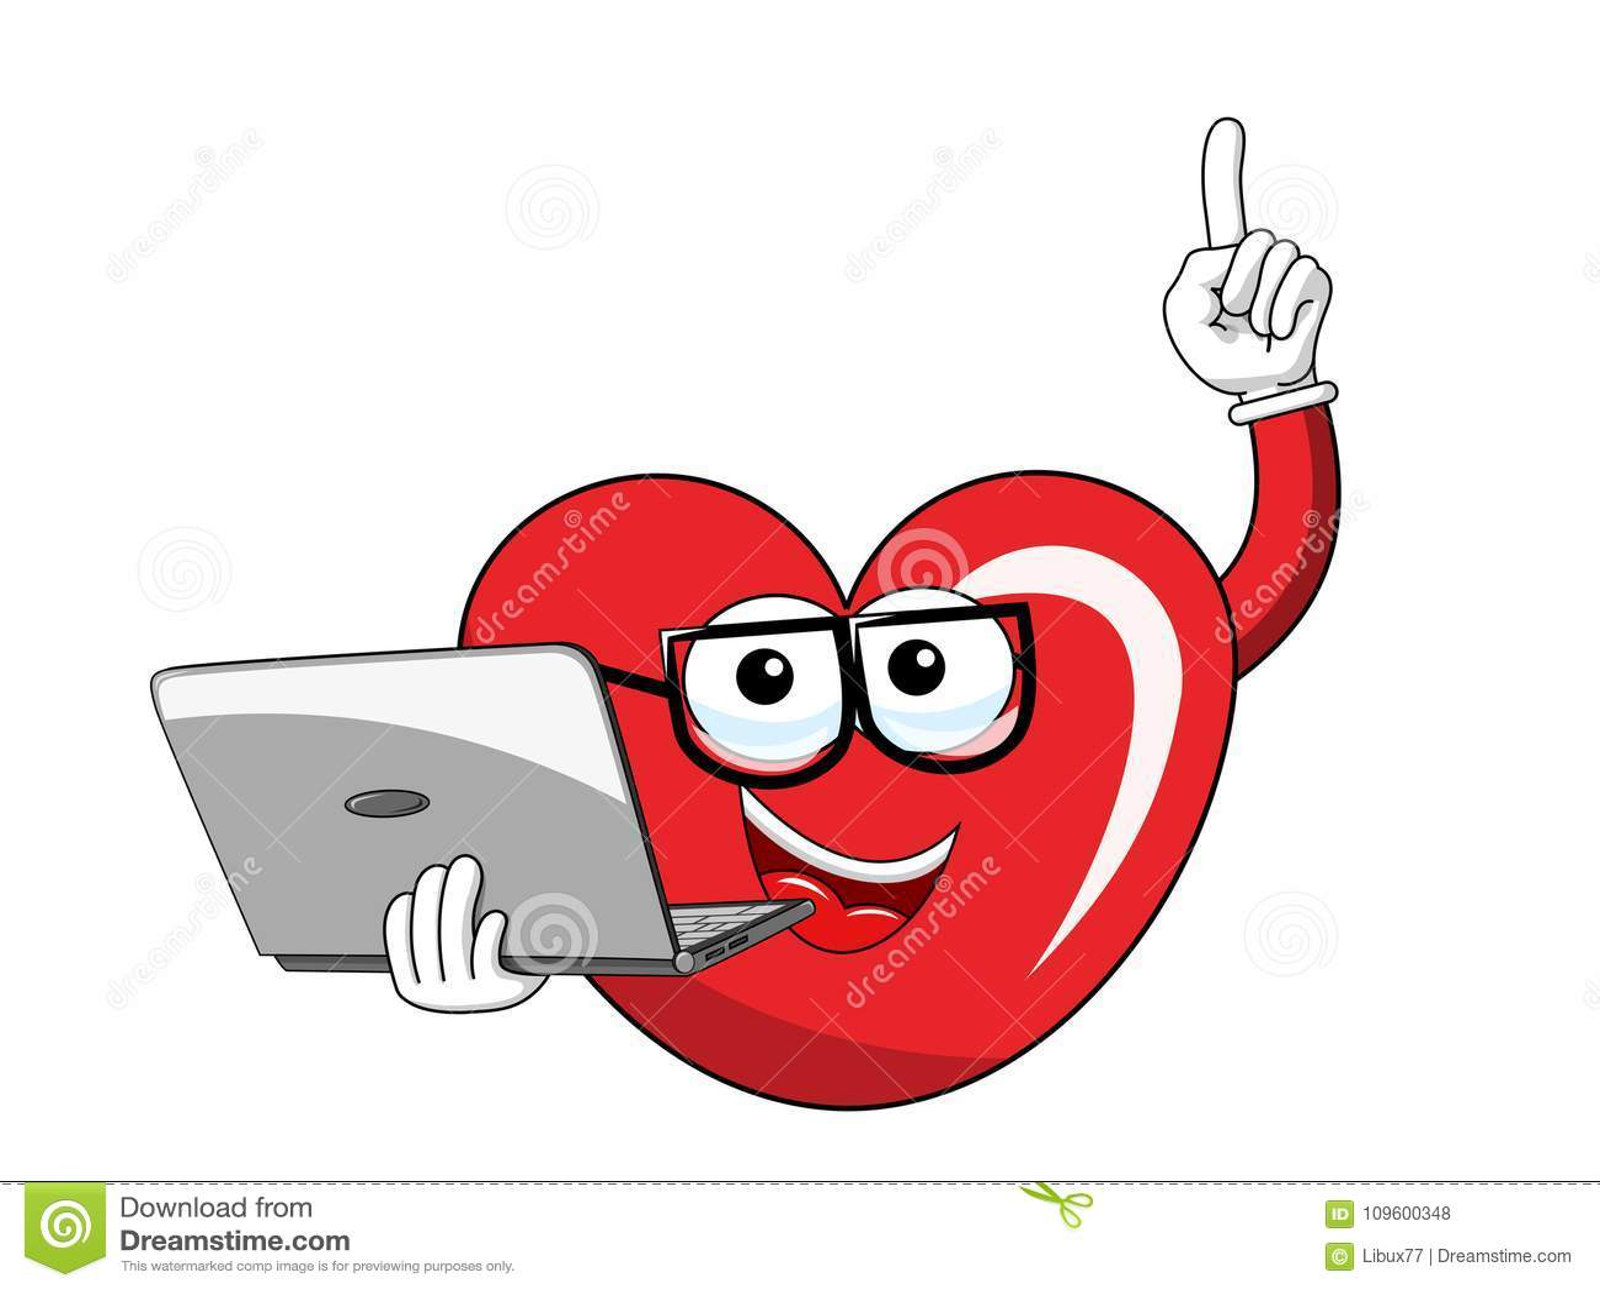 Cartoon mascot heart glasses computer laptop isolated